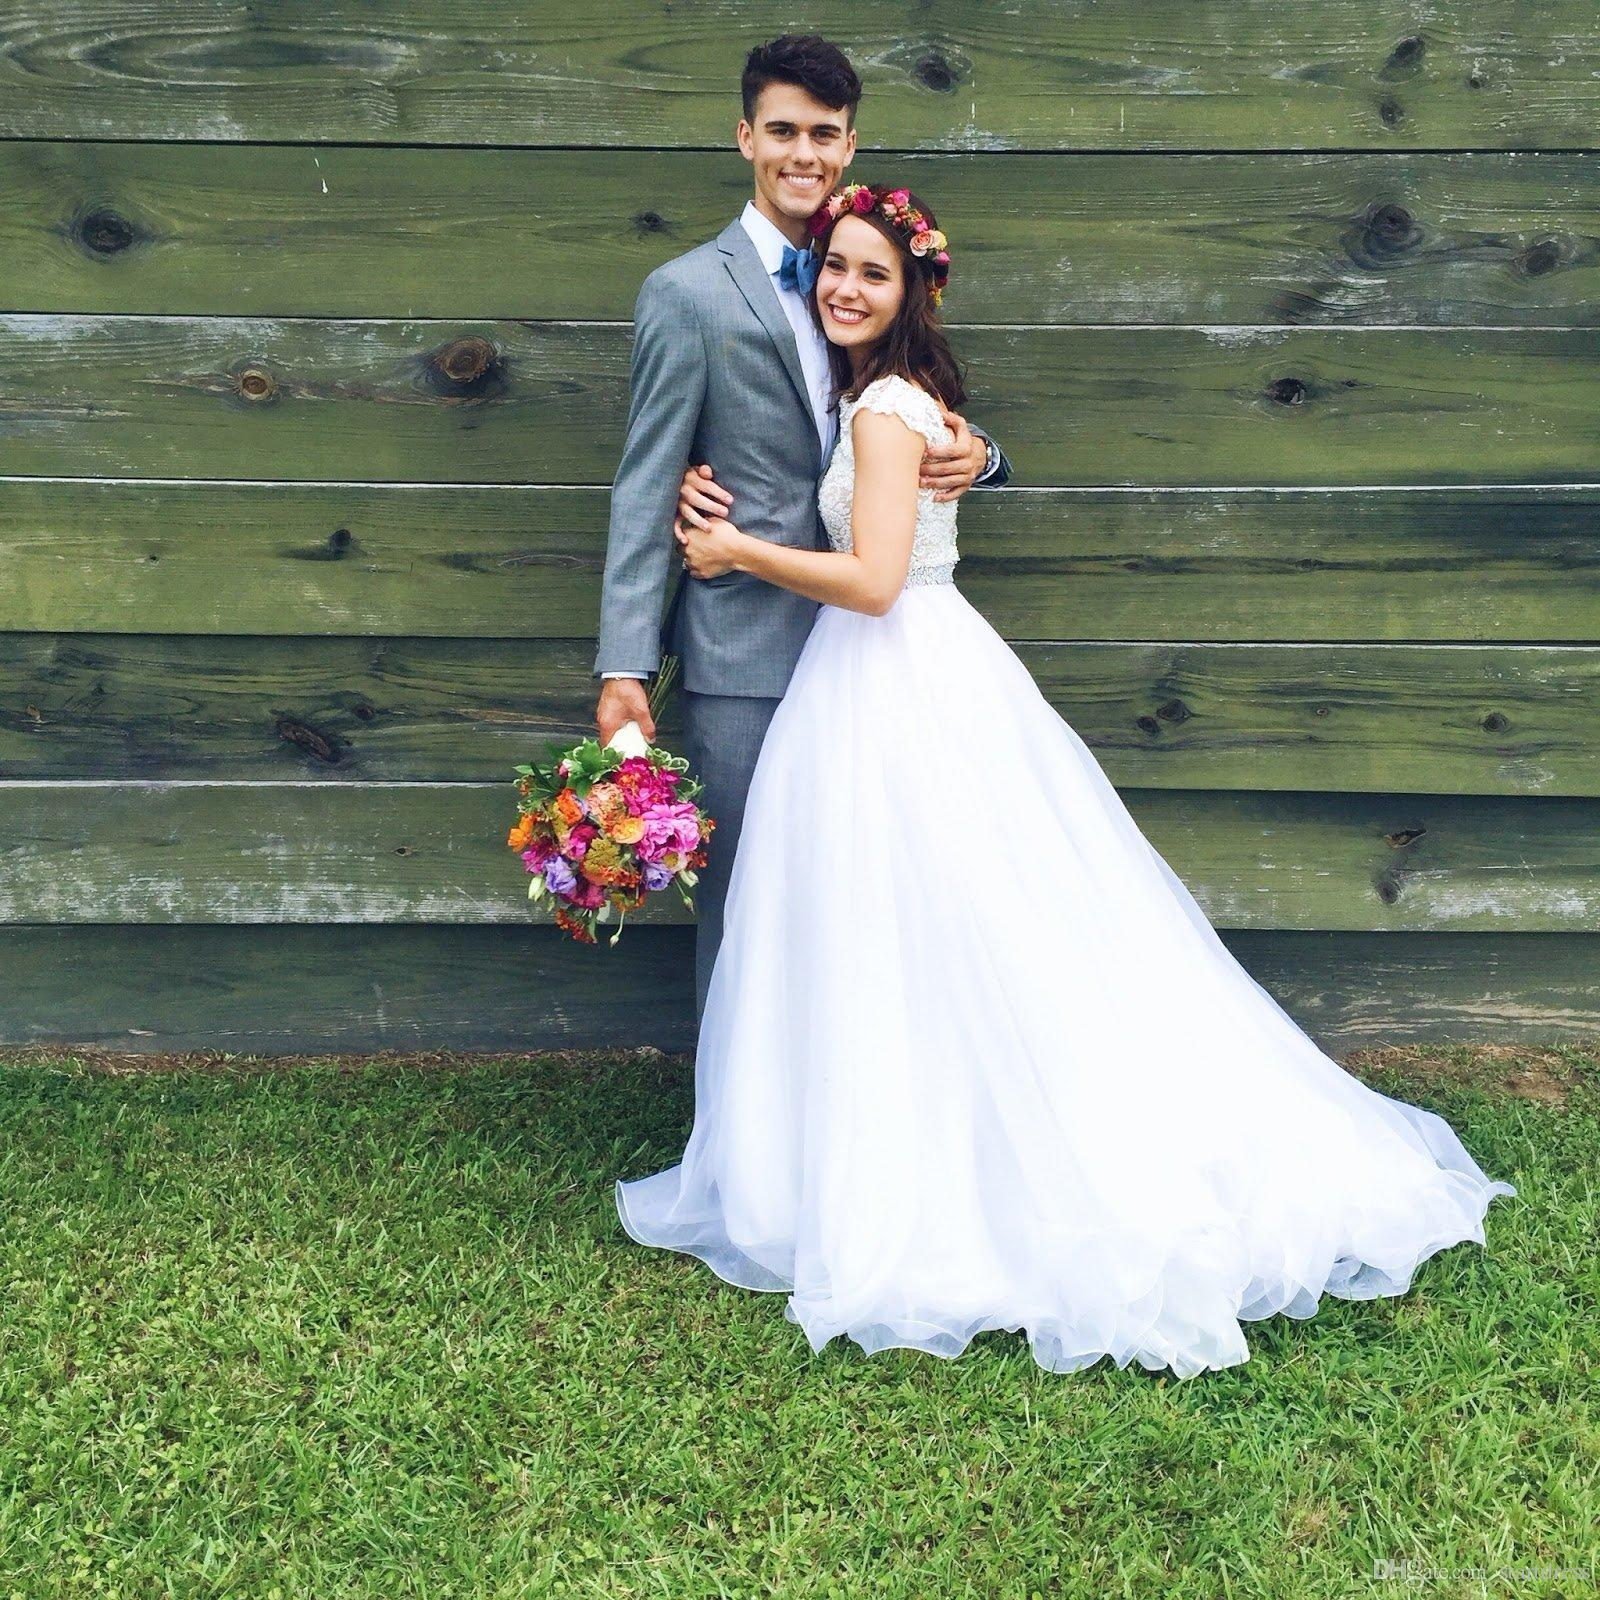 2018 Princess Summer Country Bohemian Wedding Dresses Boat Neck Top Lace Crystal Belt Cheap Beach Bridal Gowns V Backless Garden Berta China